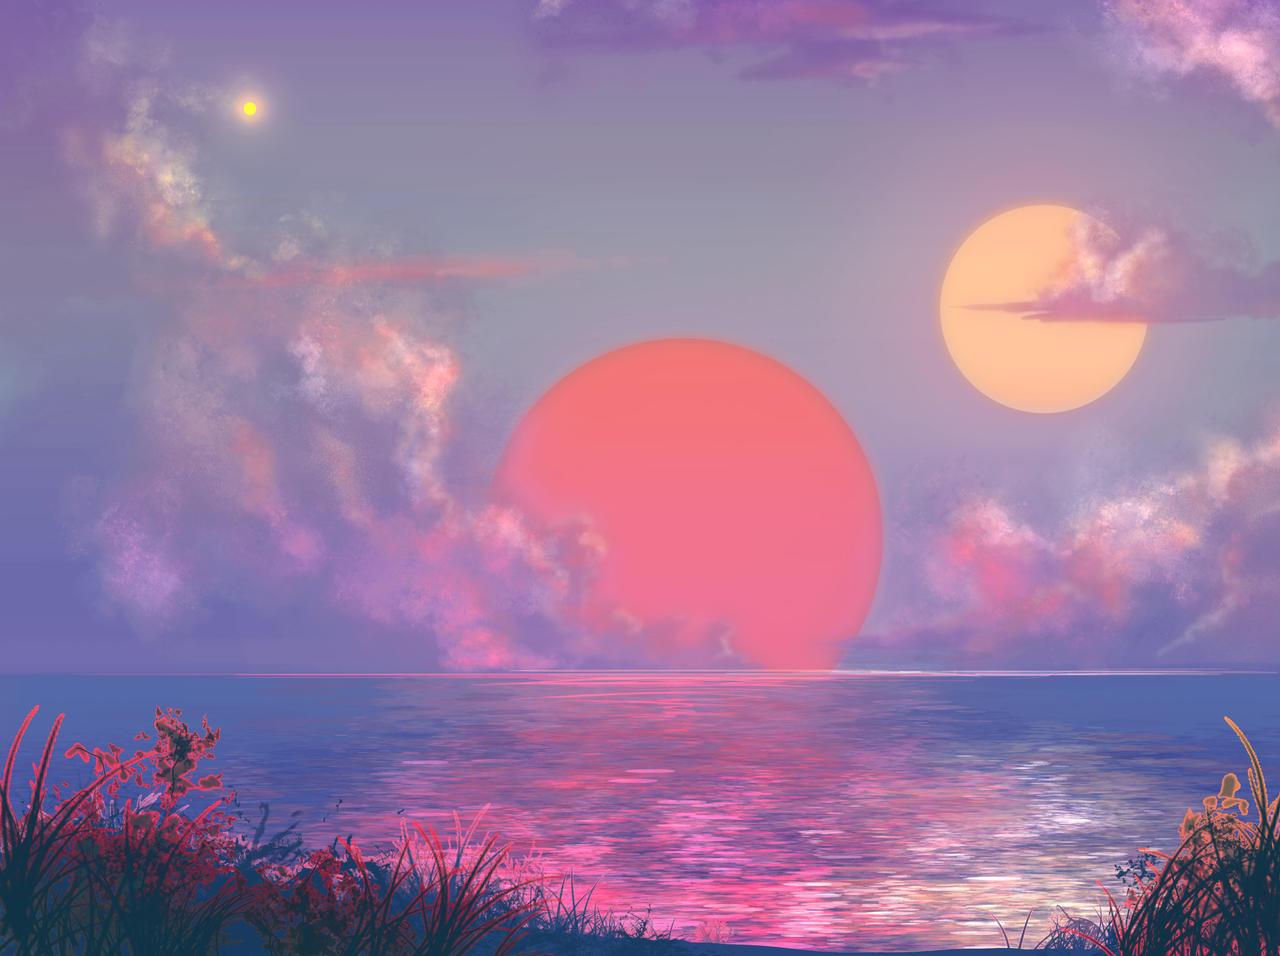 Alien Sunrise by DeepChrome